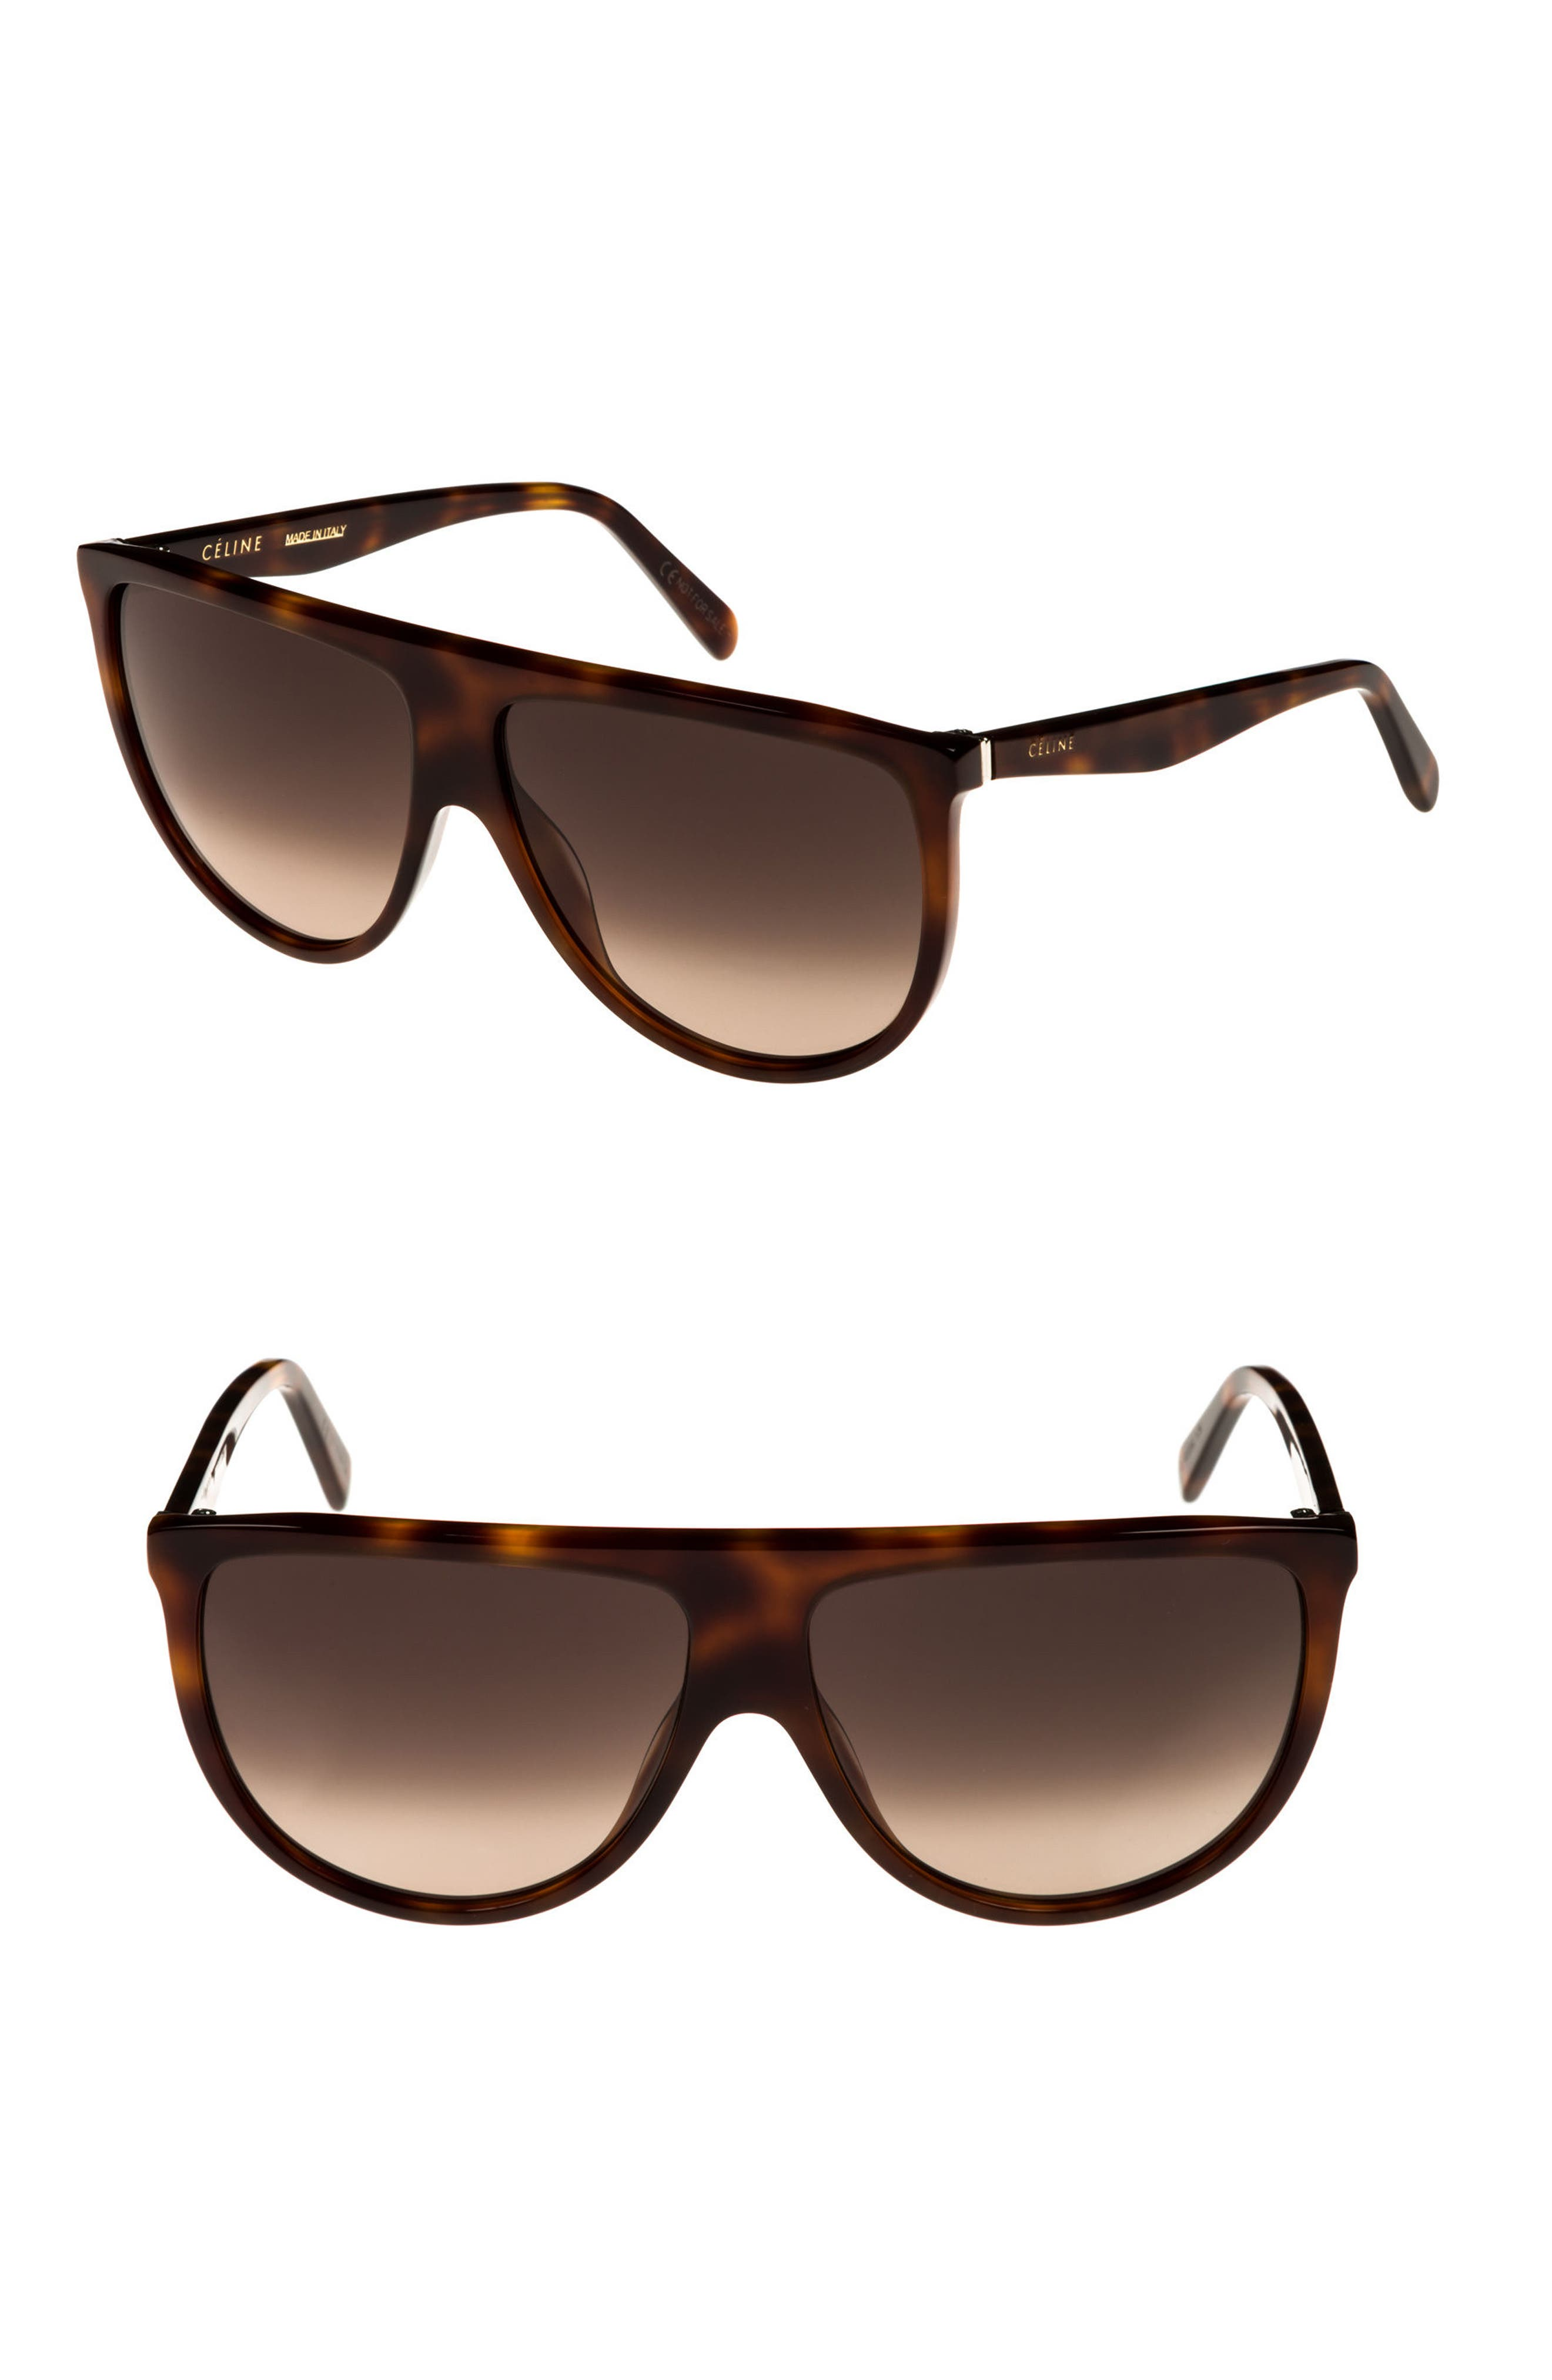 CELINE Flattop Gradient Shield Sunglasses, Light Brown in Blonde Havana